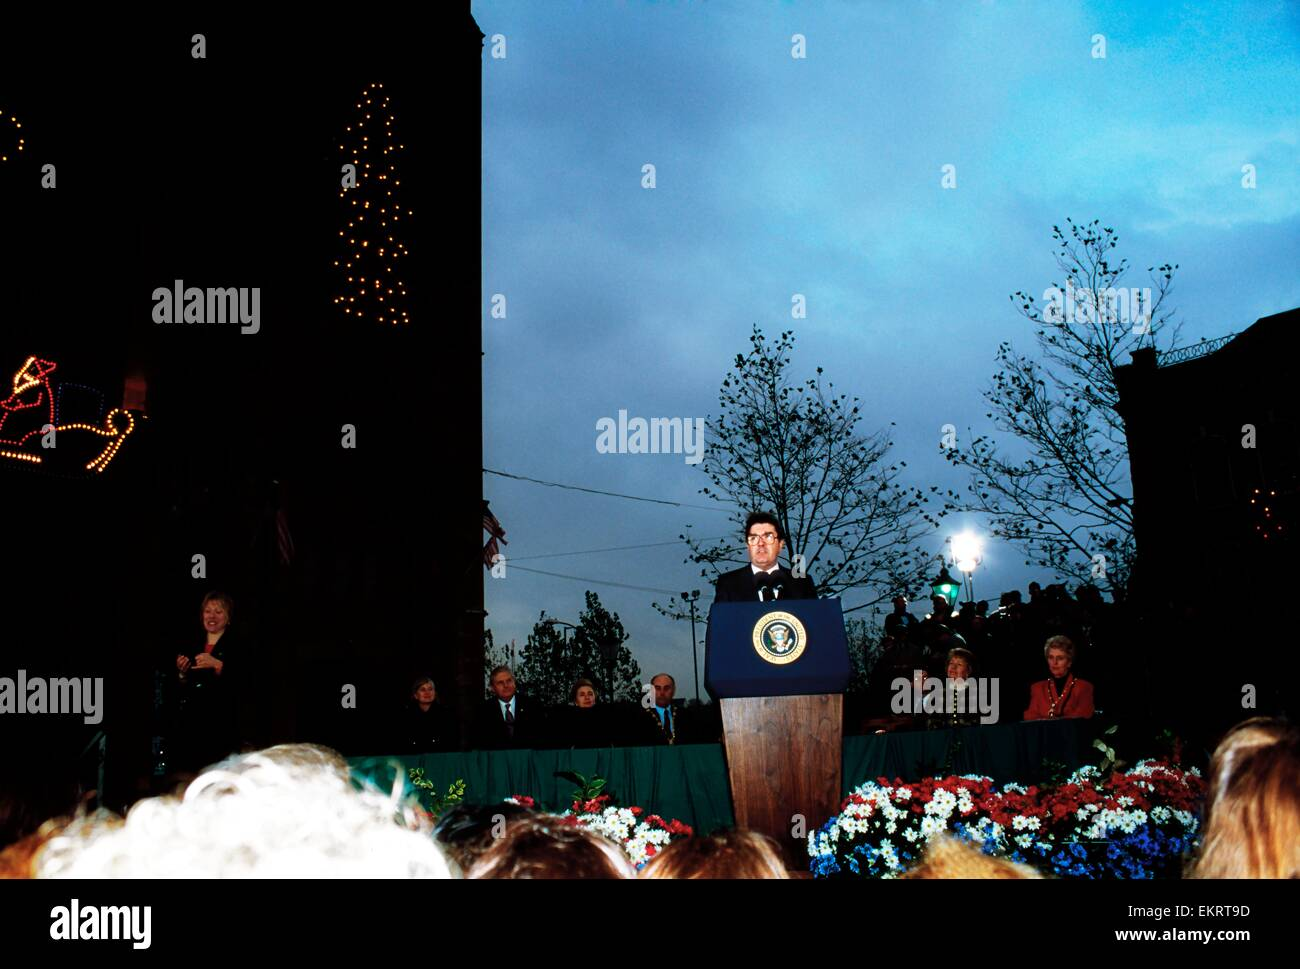 Guildhall, Derry, Co Derry, Irland; John Hume begrüßt Präsident Bill Clinton 1995 Stockbild